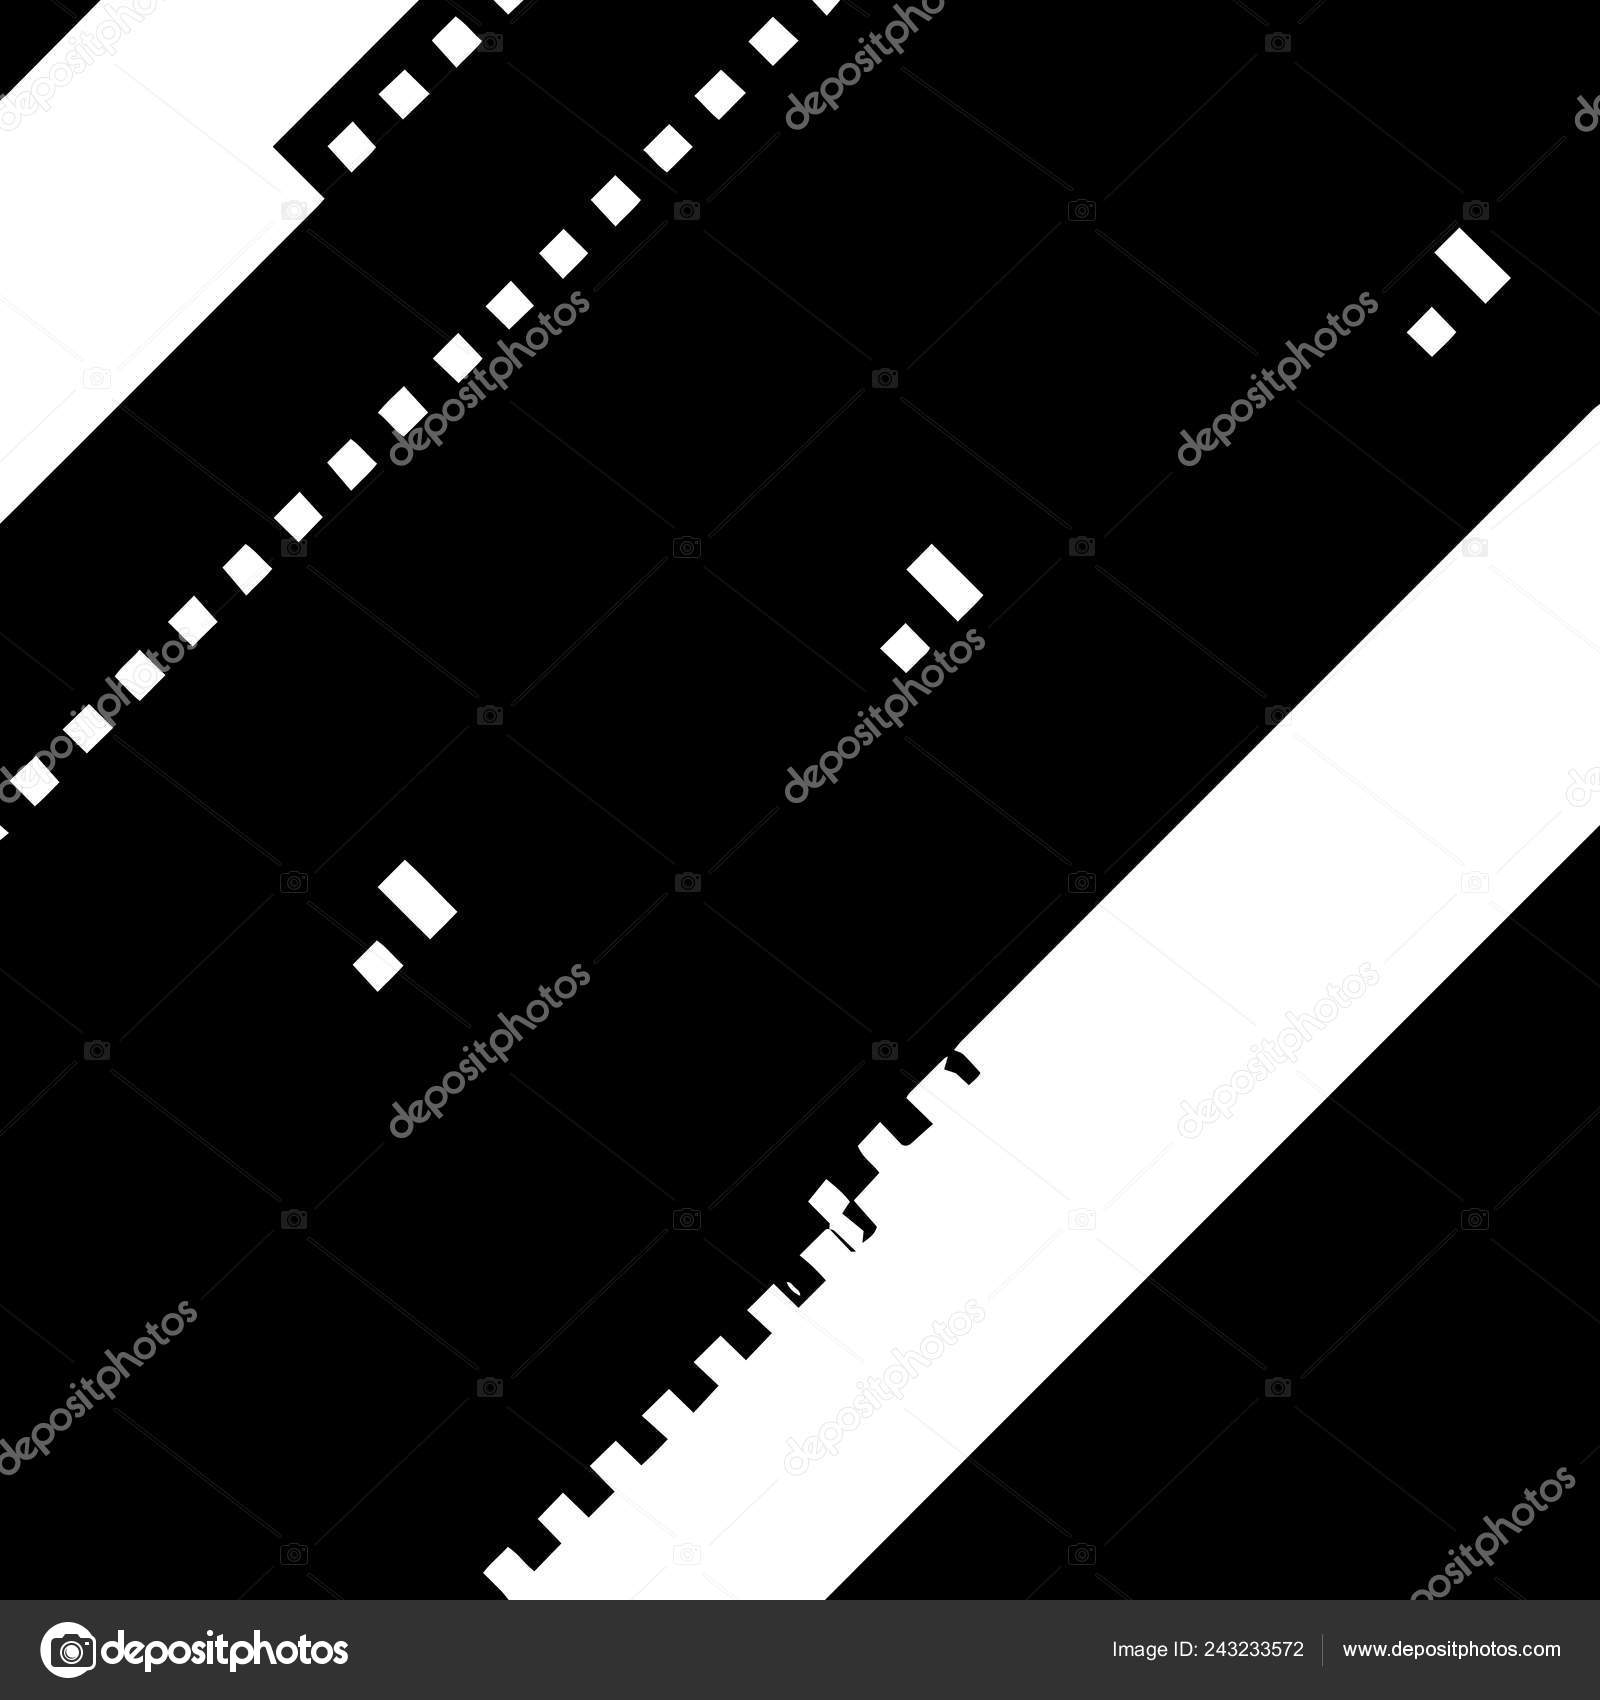 Diagonal Glitch Overlay — Stock Vector © benjaminlion #243233572